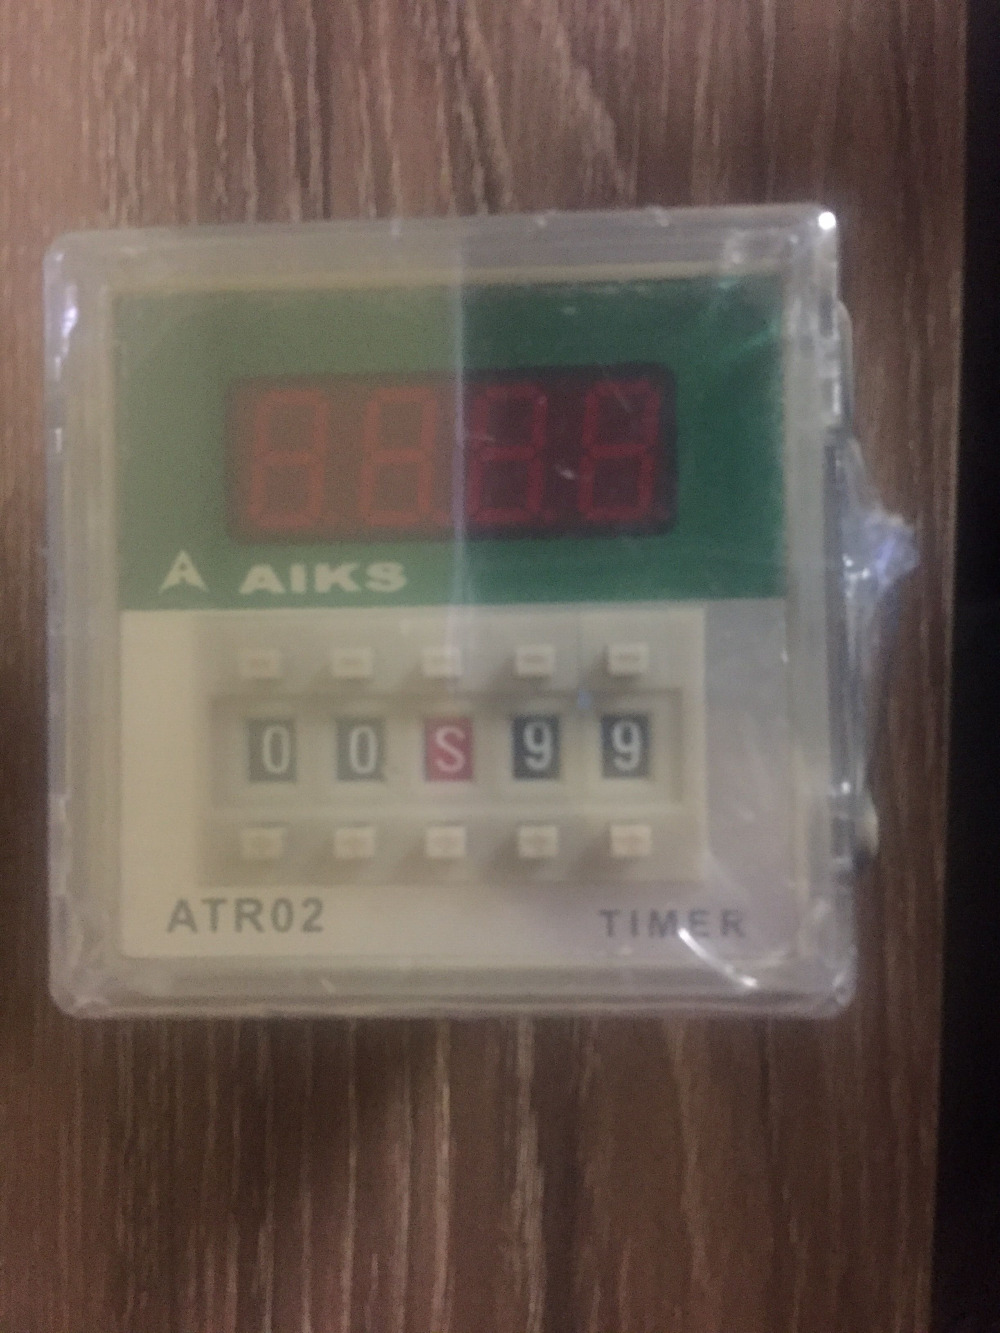 AIKS AUX temps relais ATR02-B2 AC220V alternative parfaite DH48S